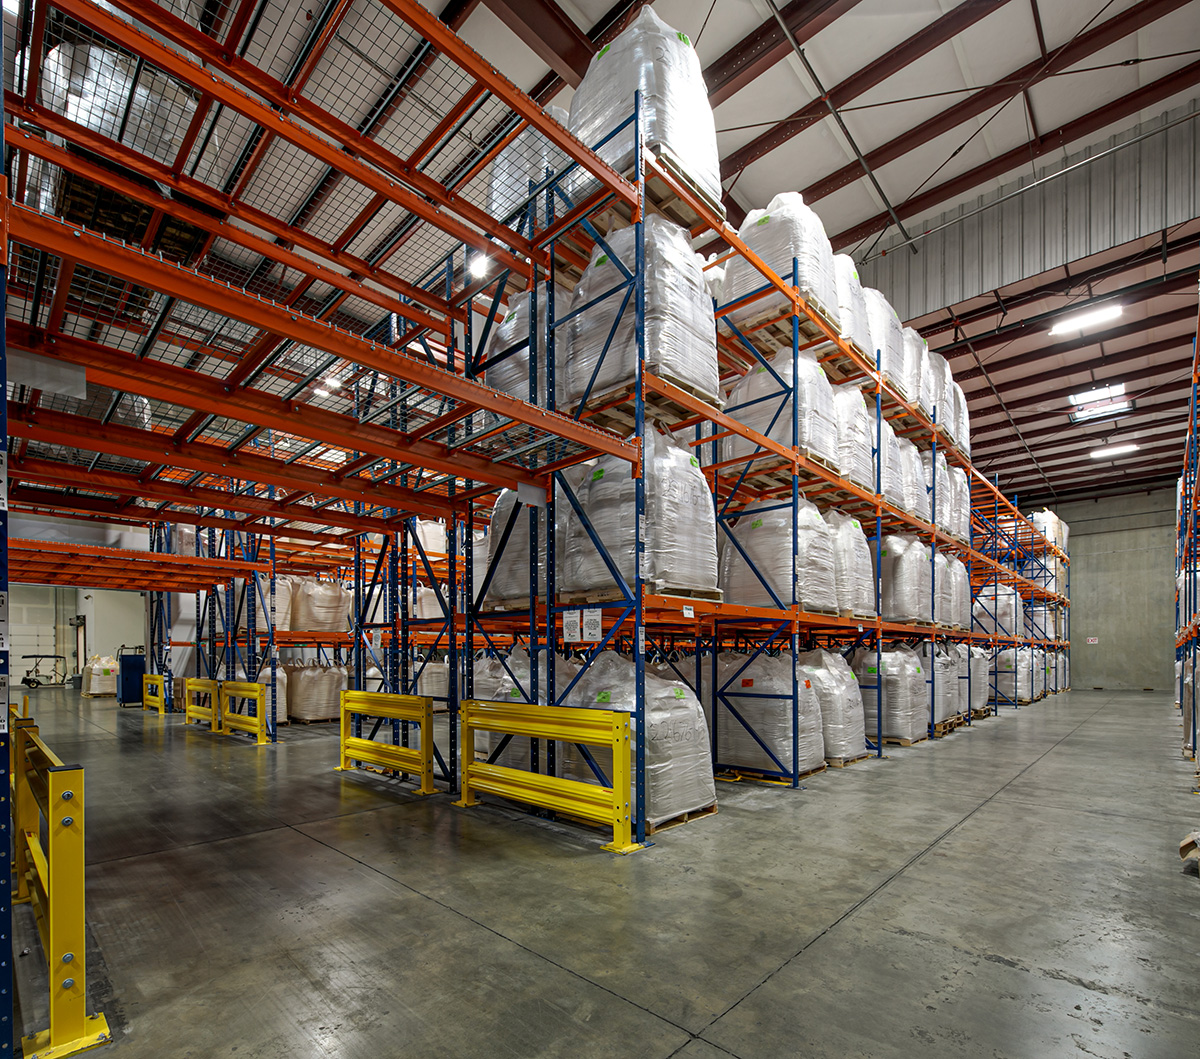 Racks of goods in dry storage at BCS.